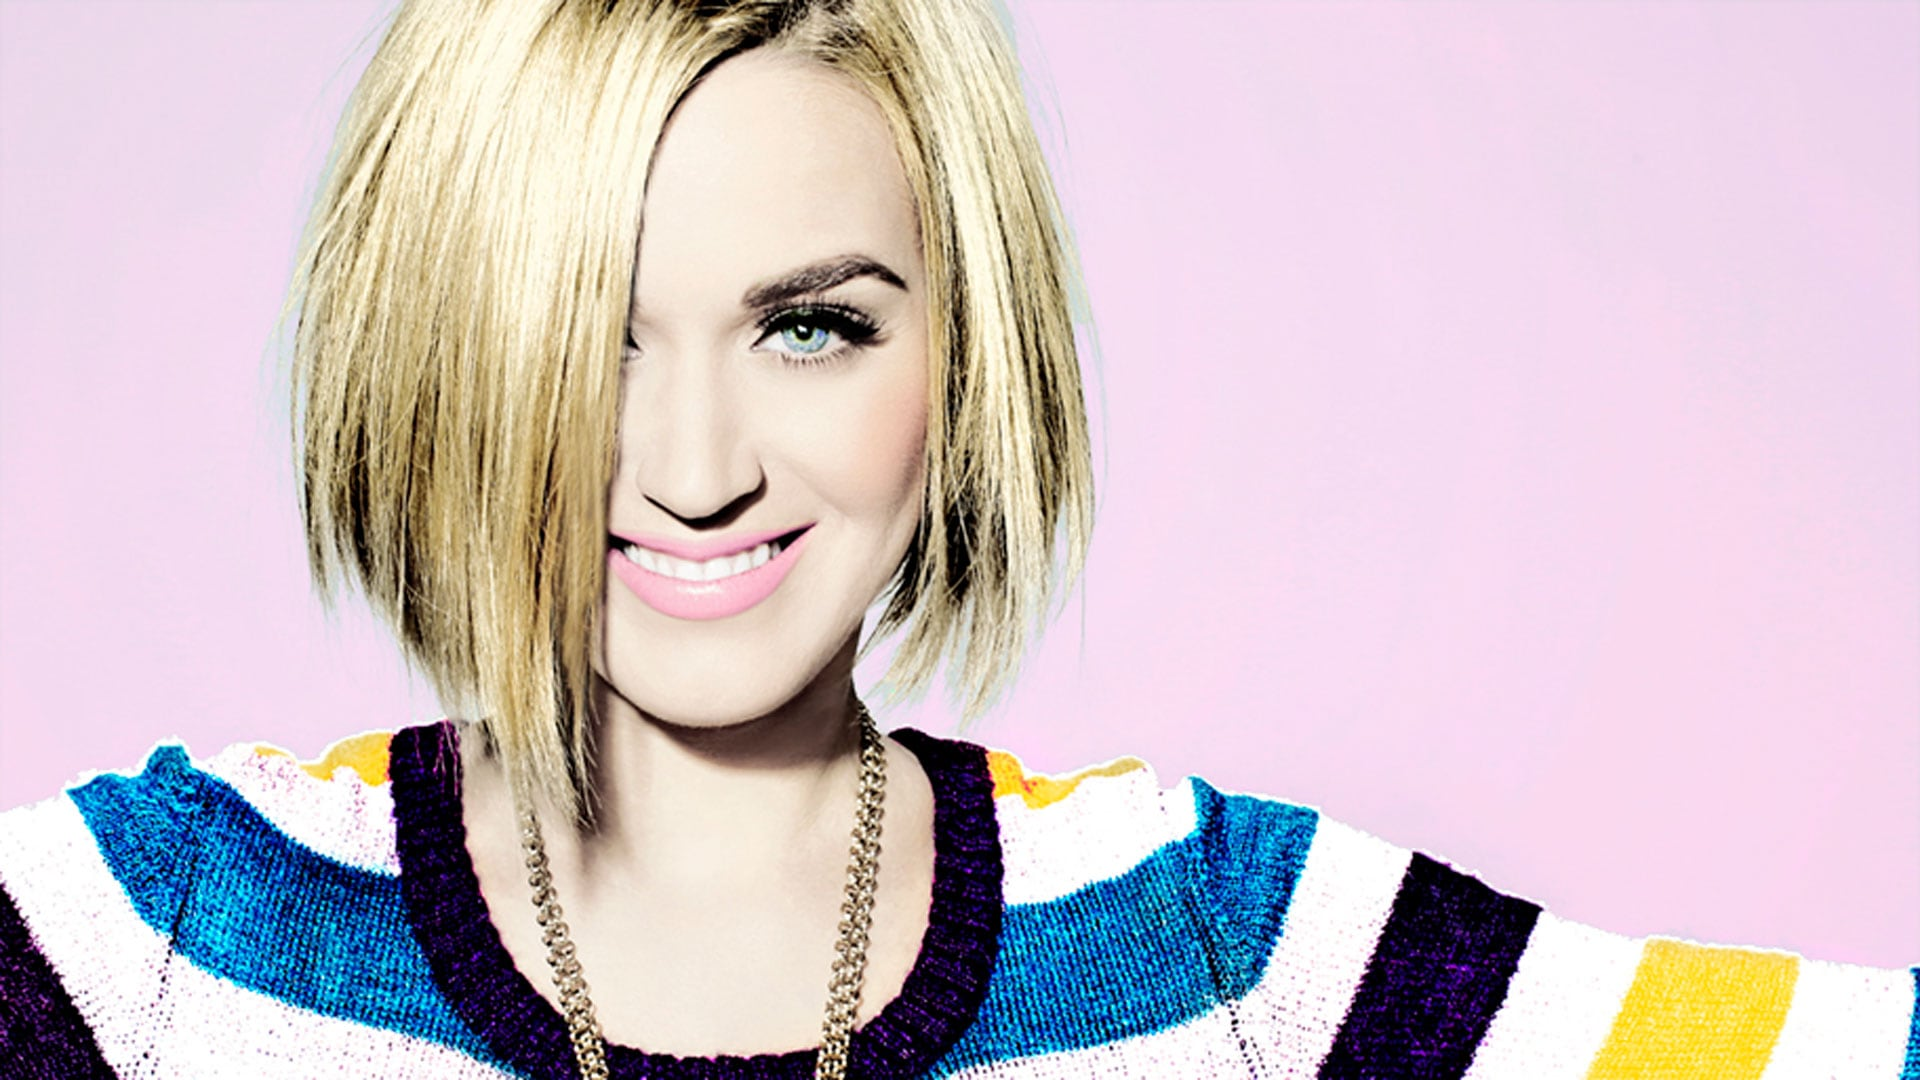 Katy Perry: December 10, 2011